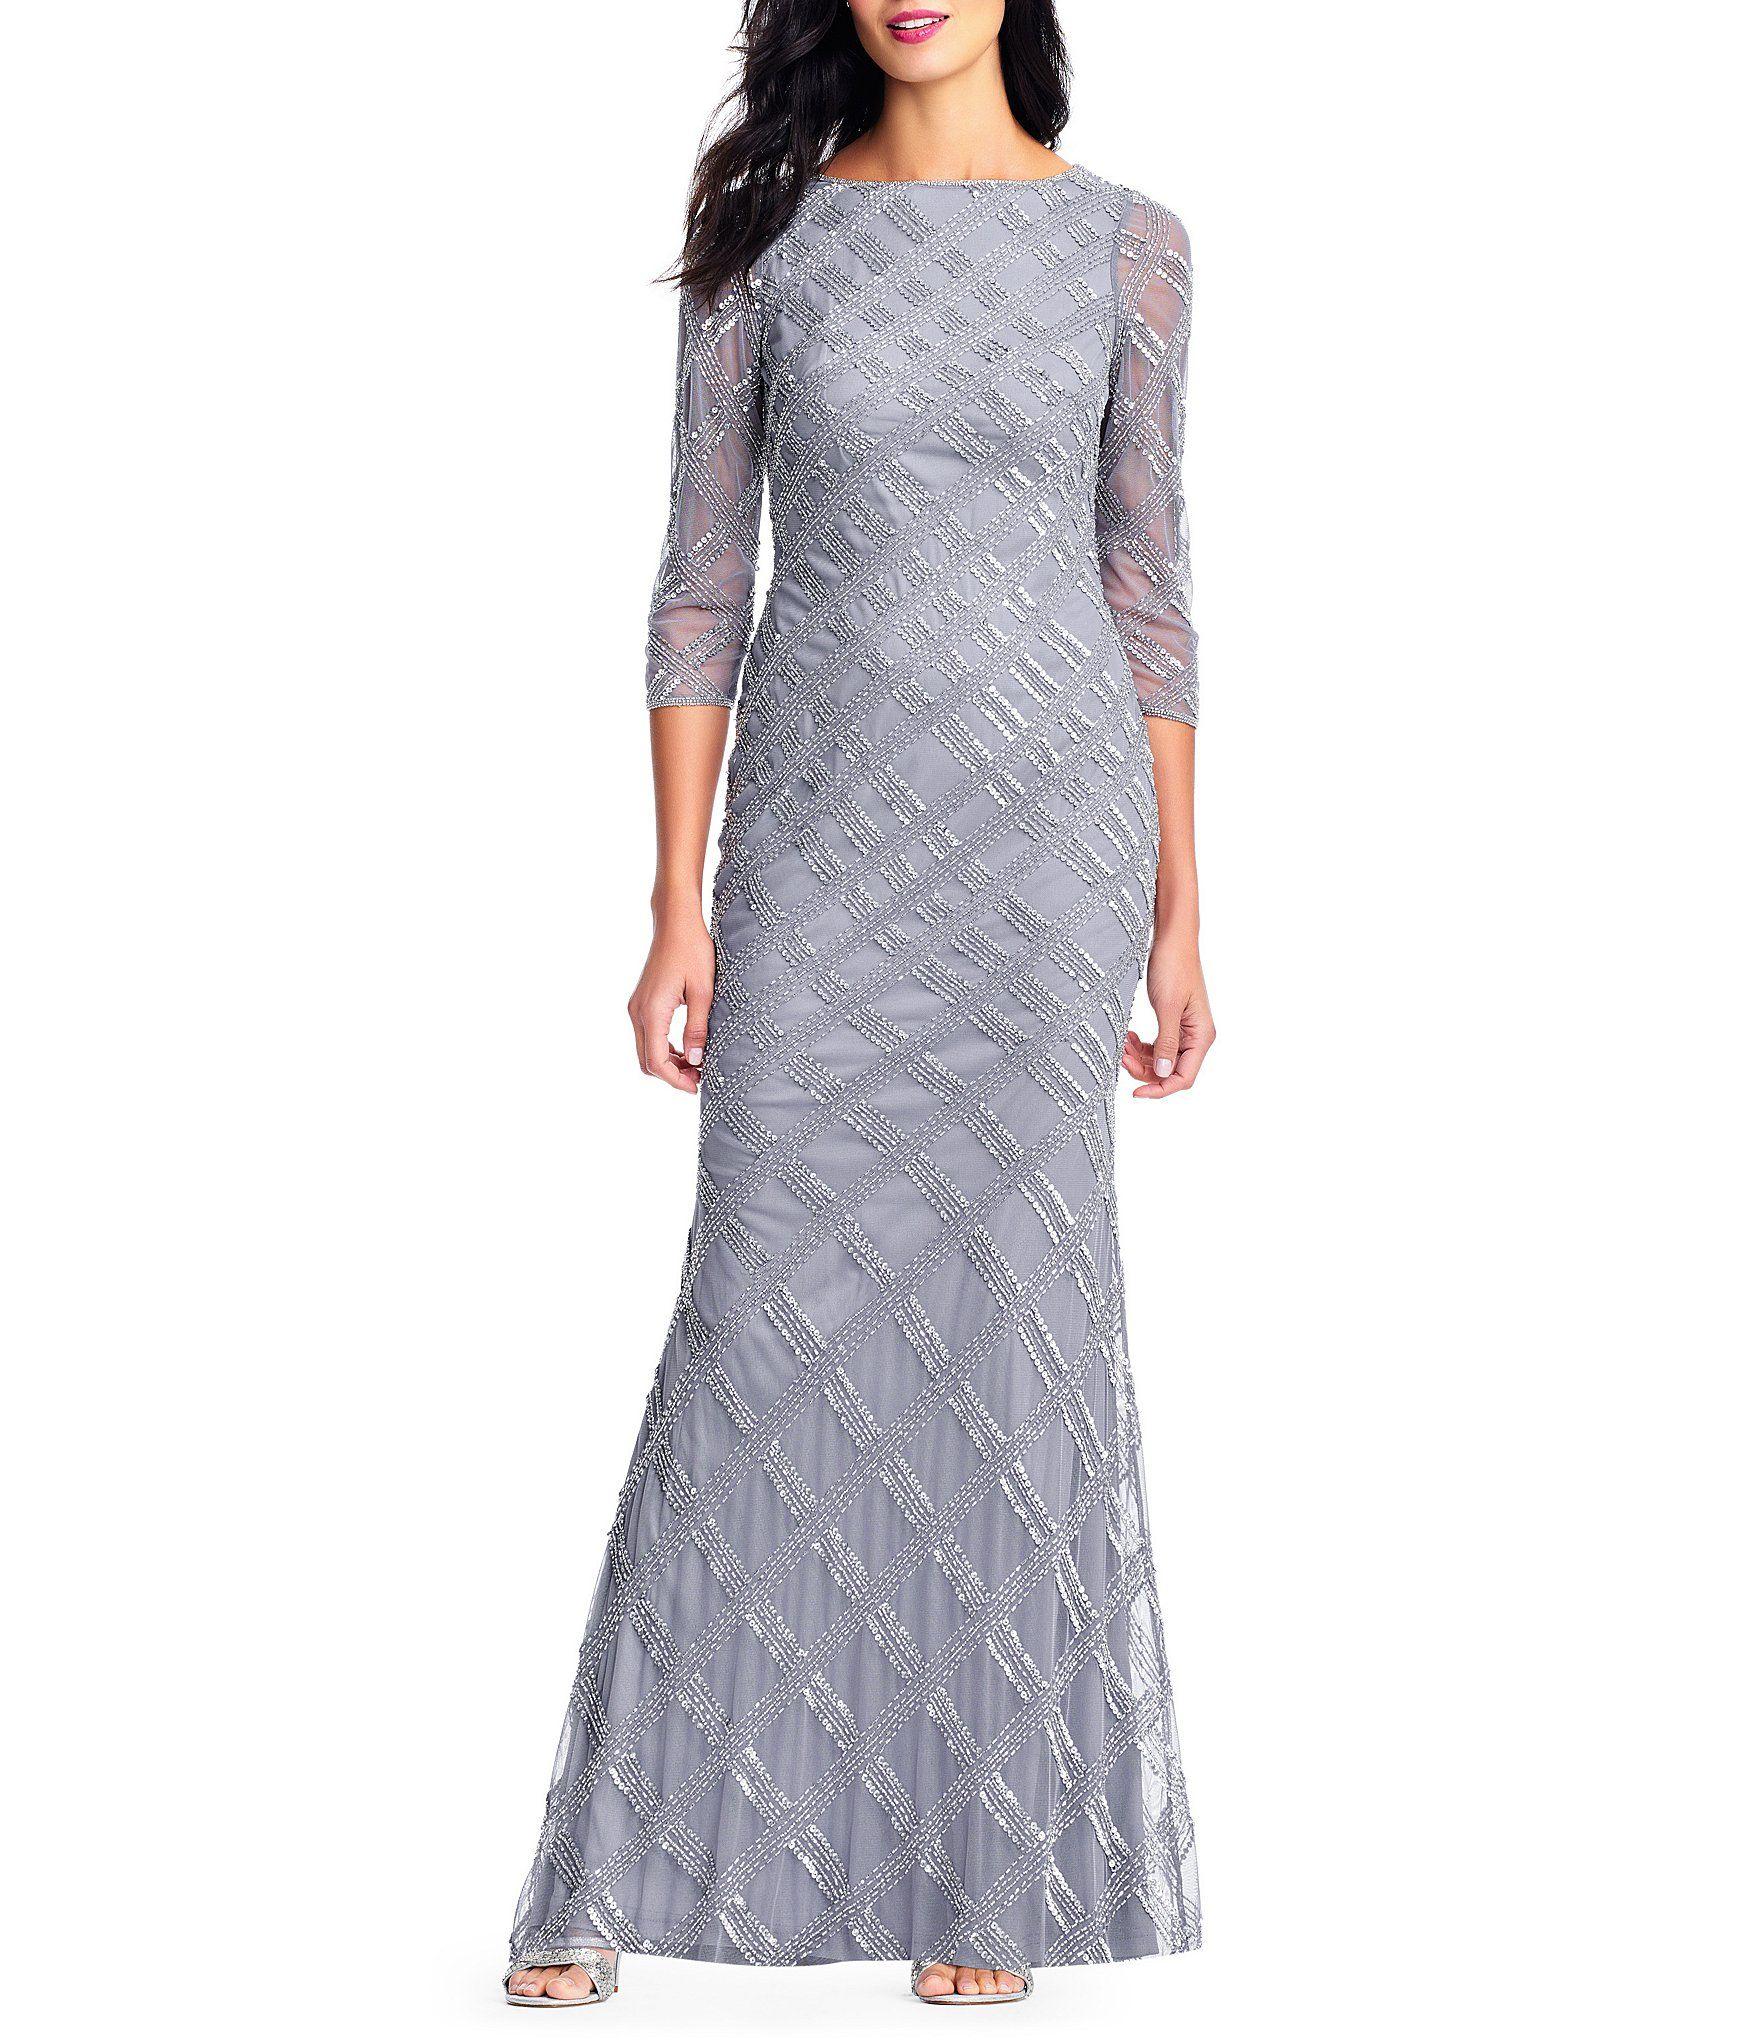 2e035f8c76 Dillards Petite Formal Long Dresses - Gomes Weine AG